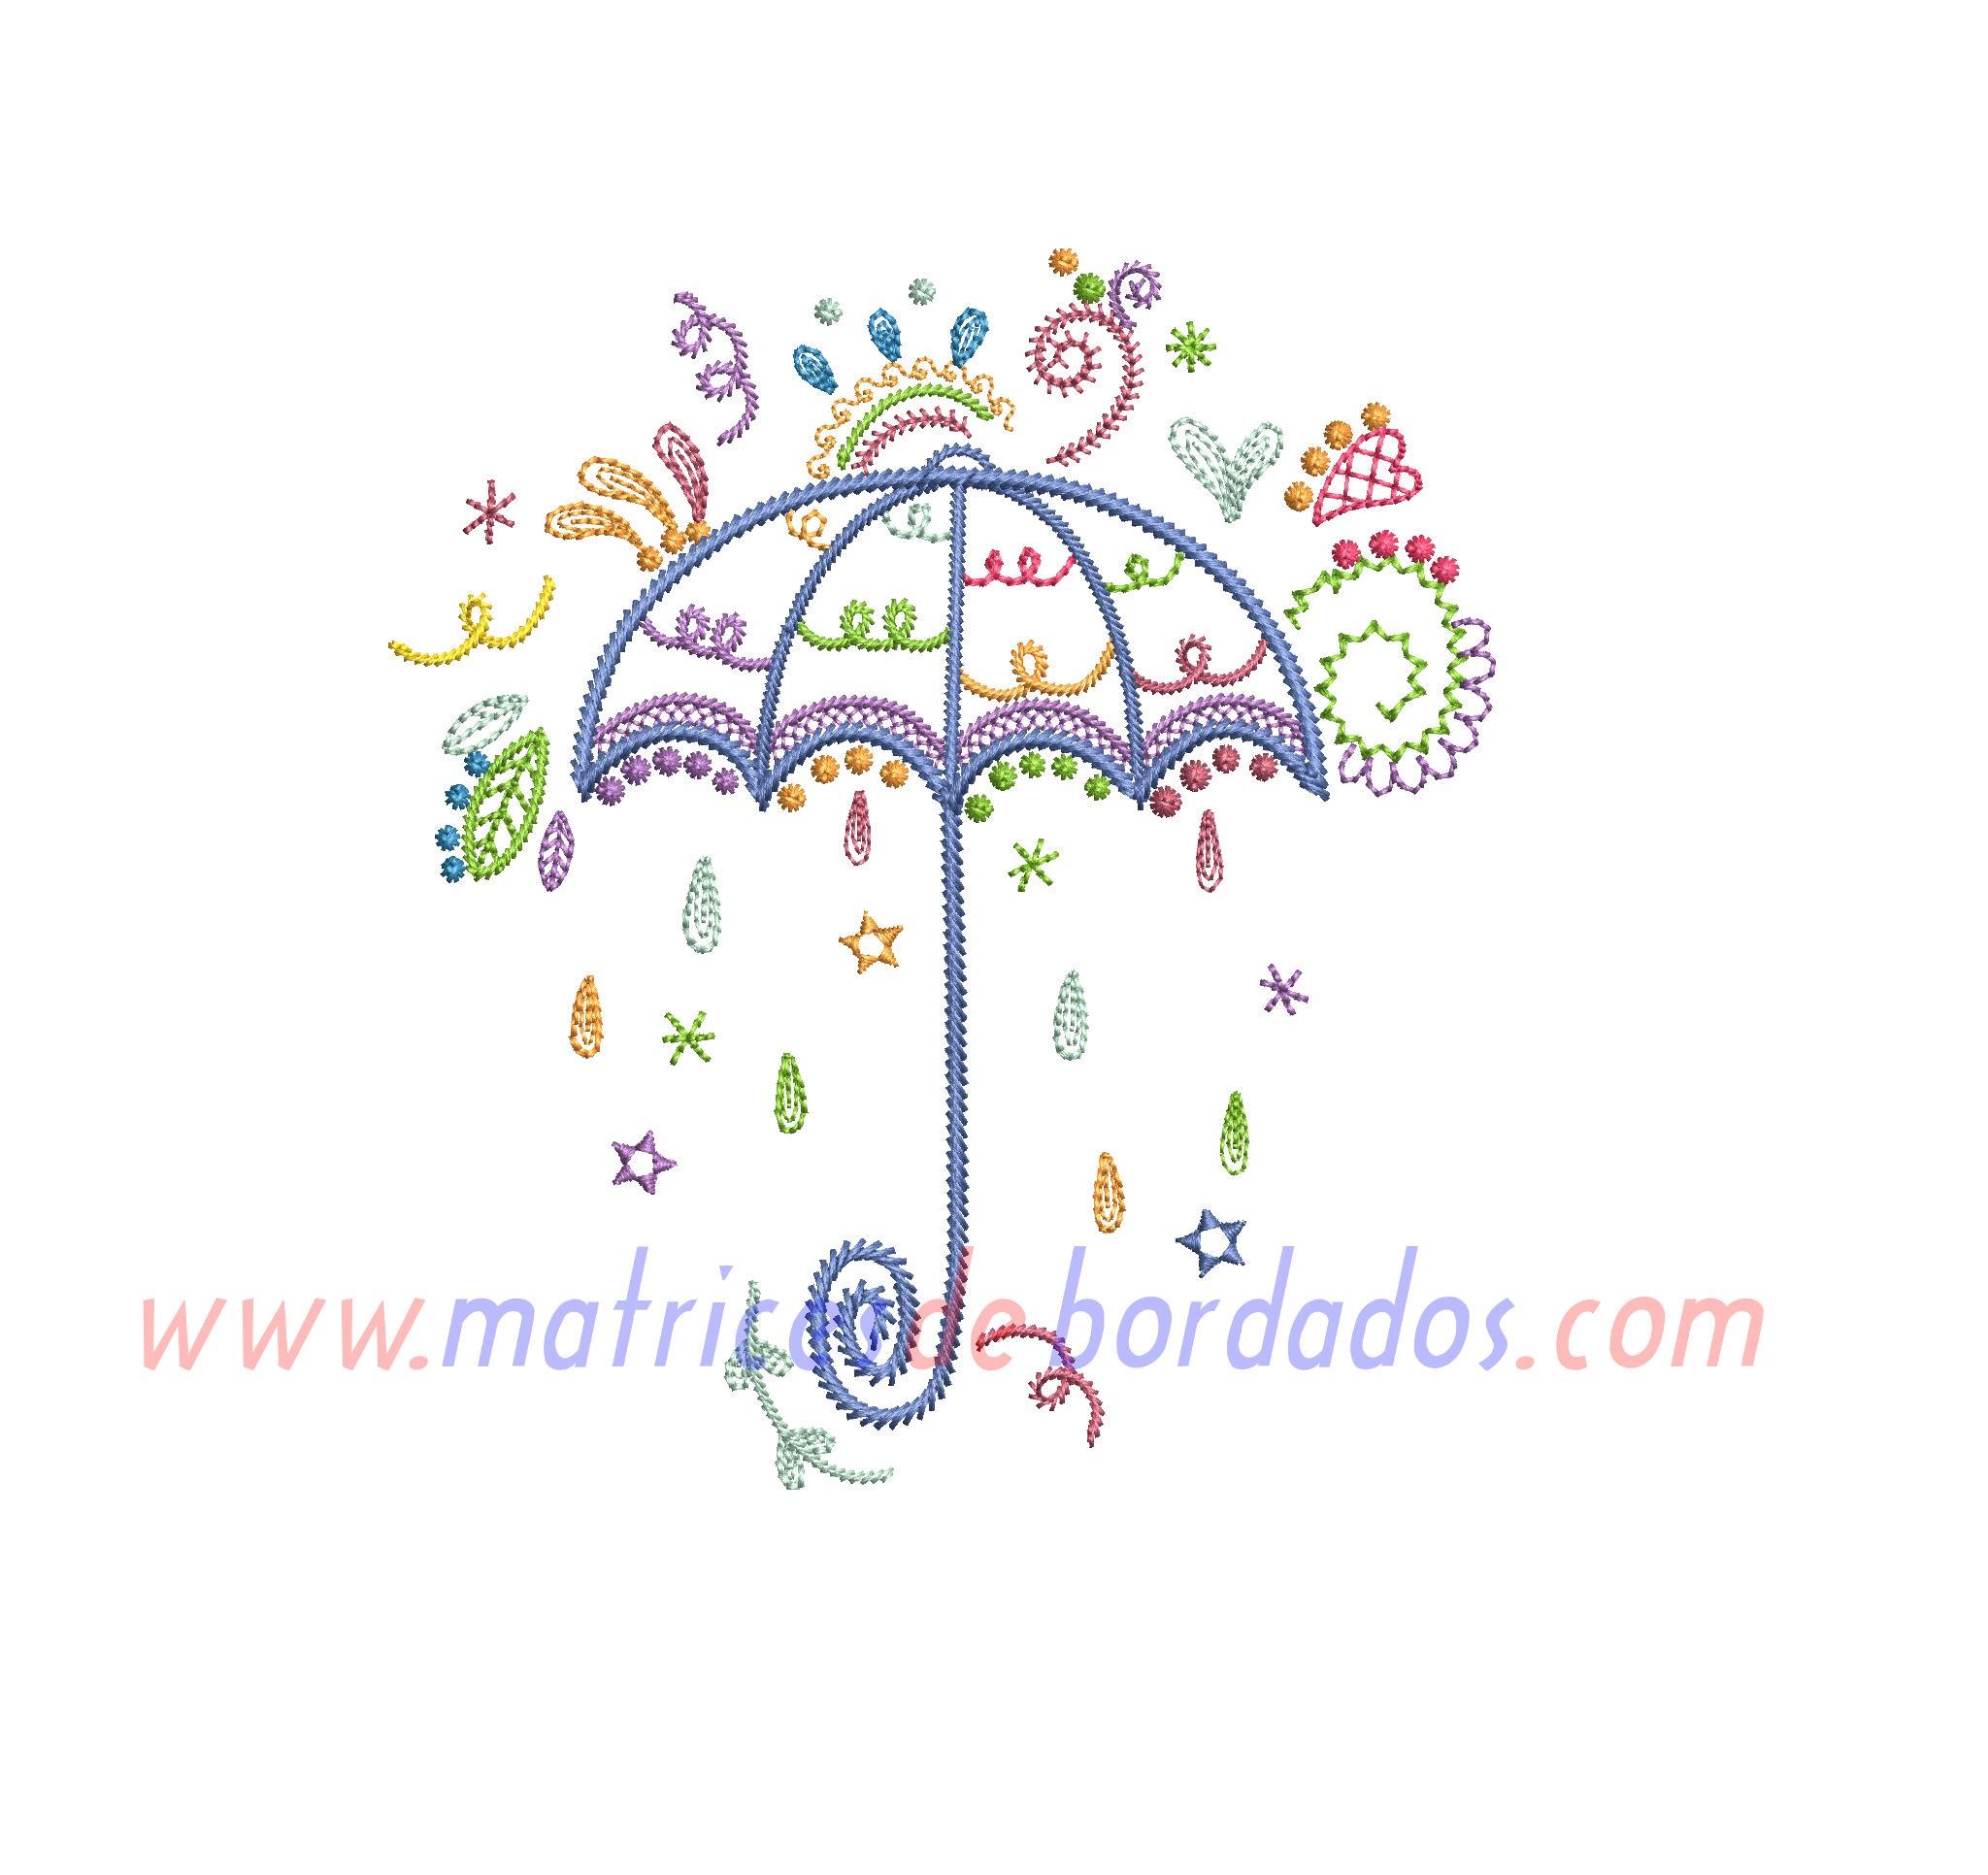 BD58DK - Paraguas Colorido